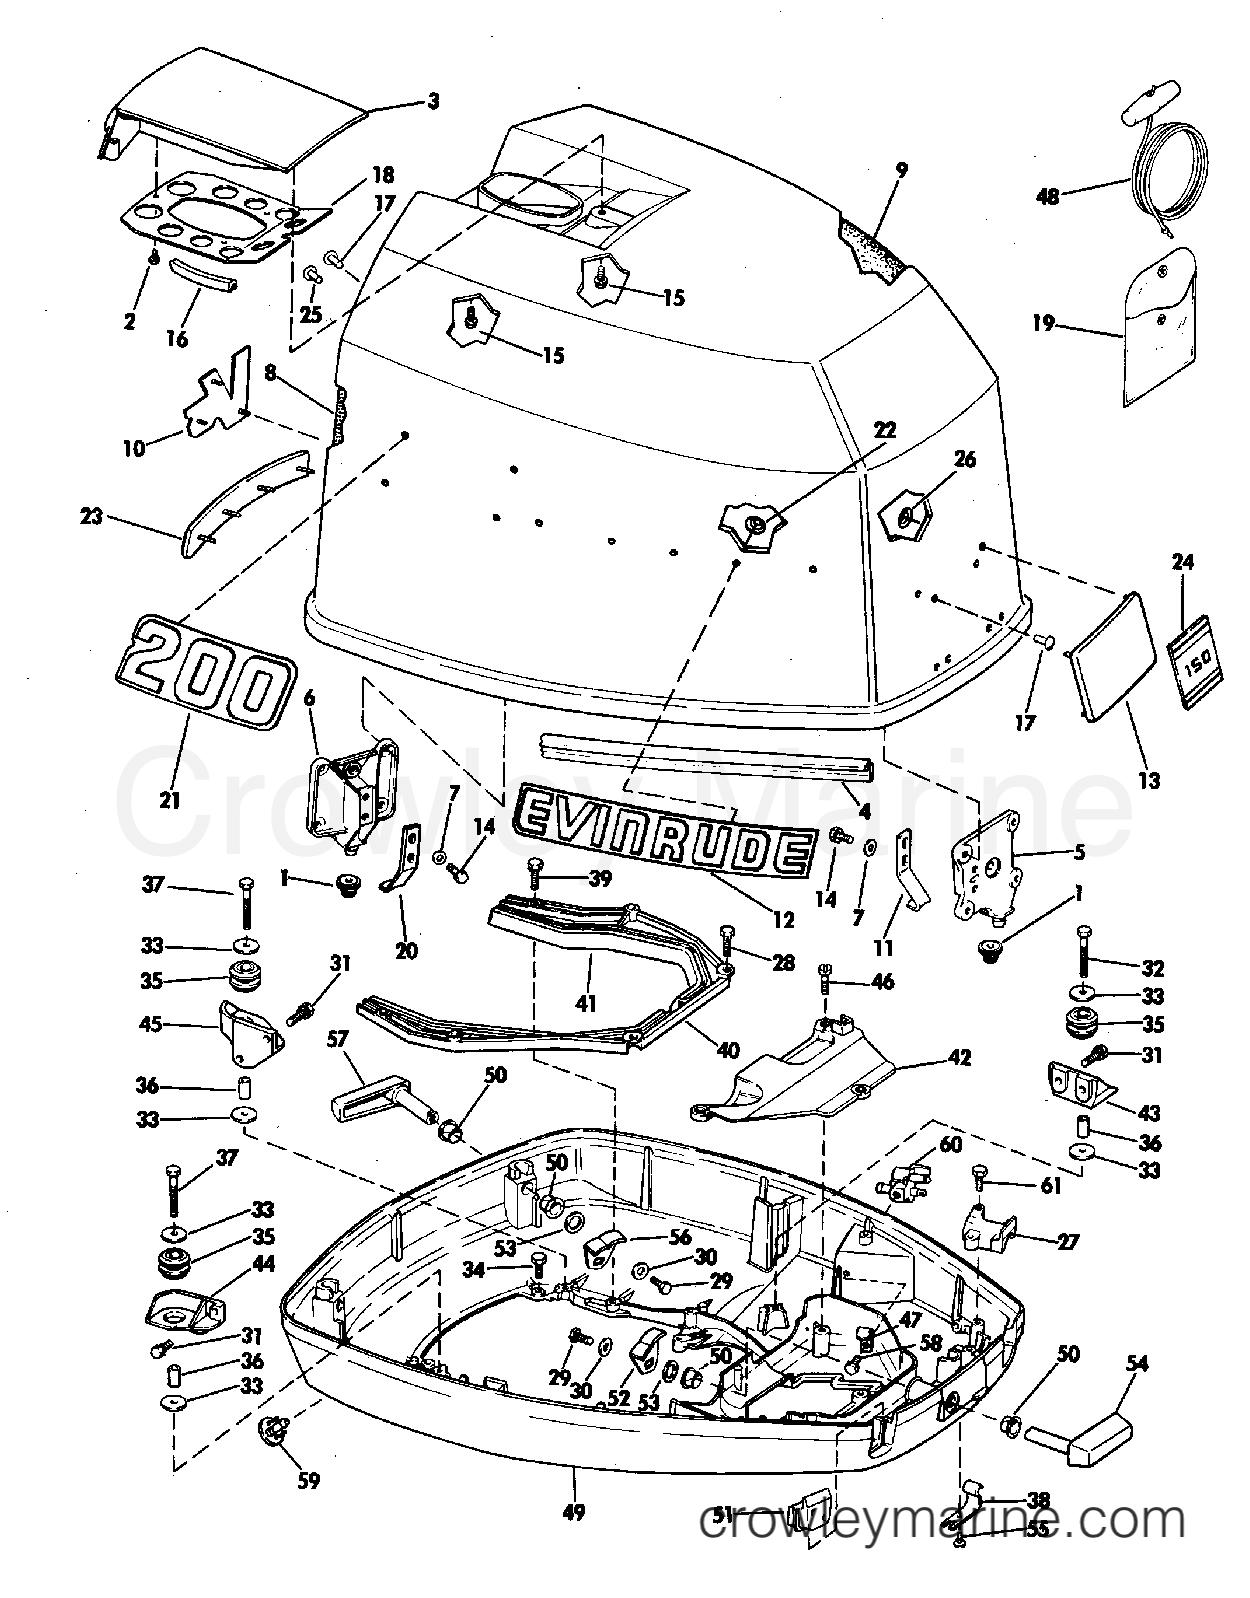 1981 Evinrude Outboards 150 - E150TRLCIA MOTOR COVER-EVINRUDE section